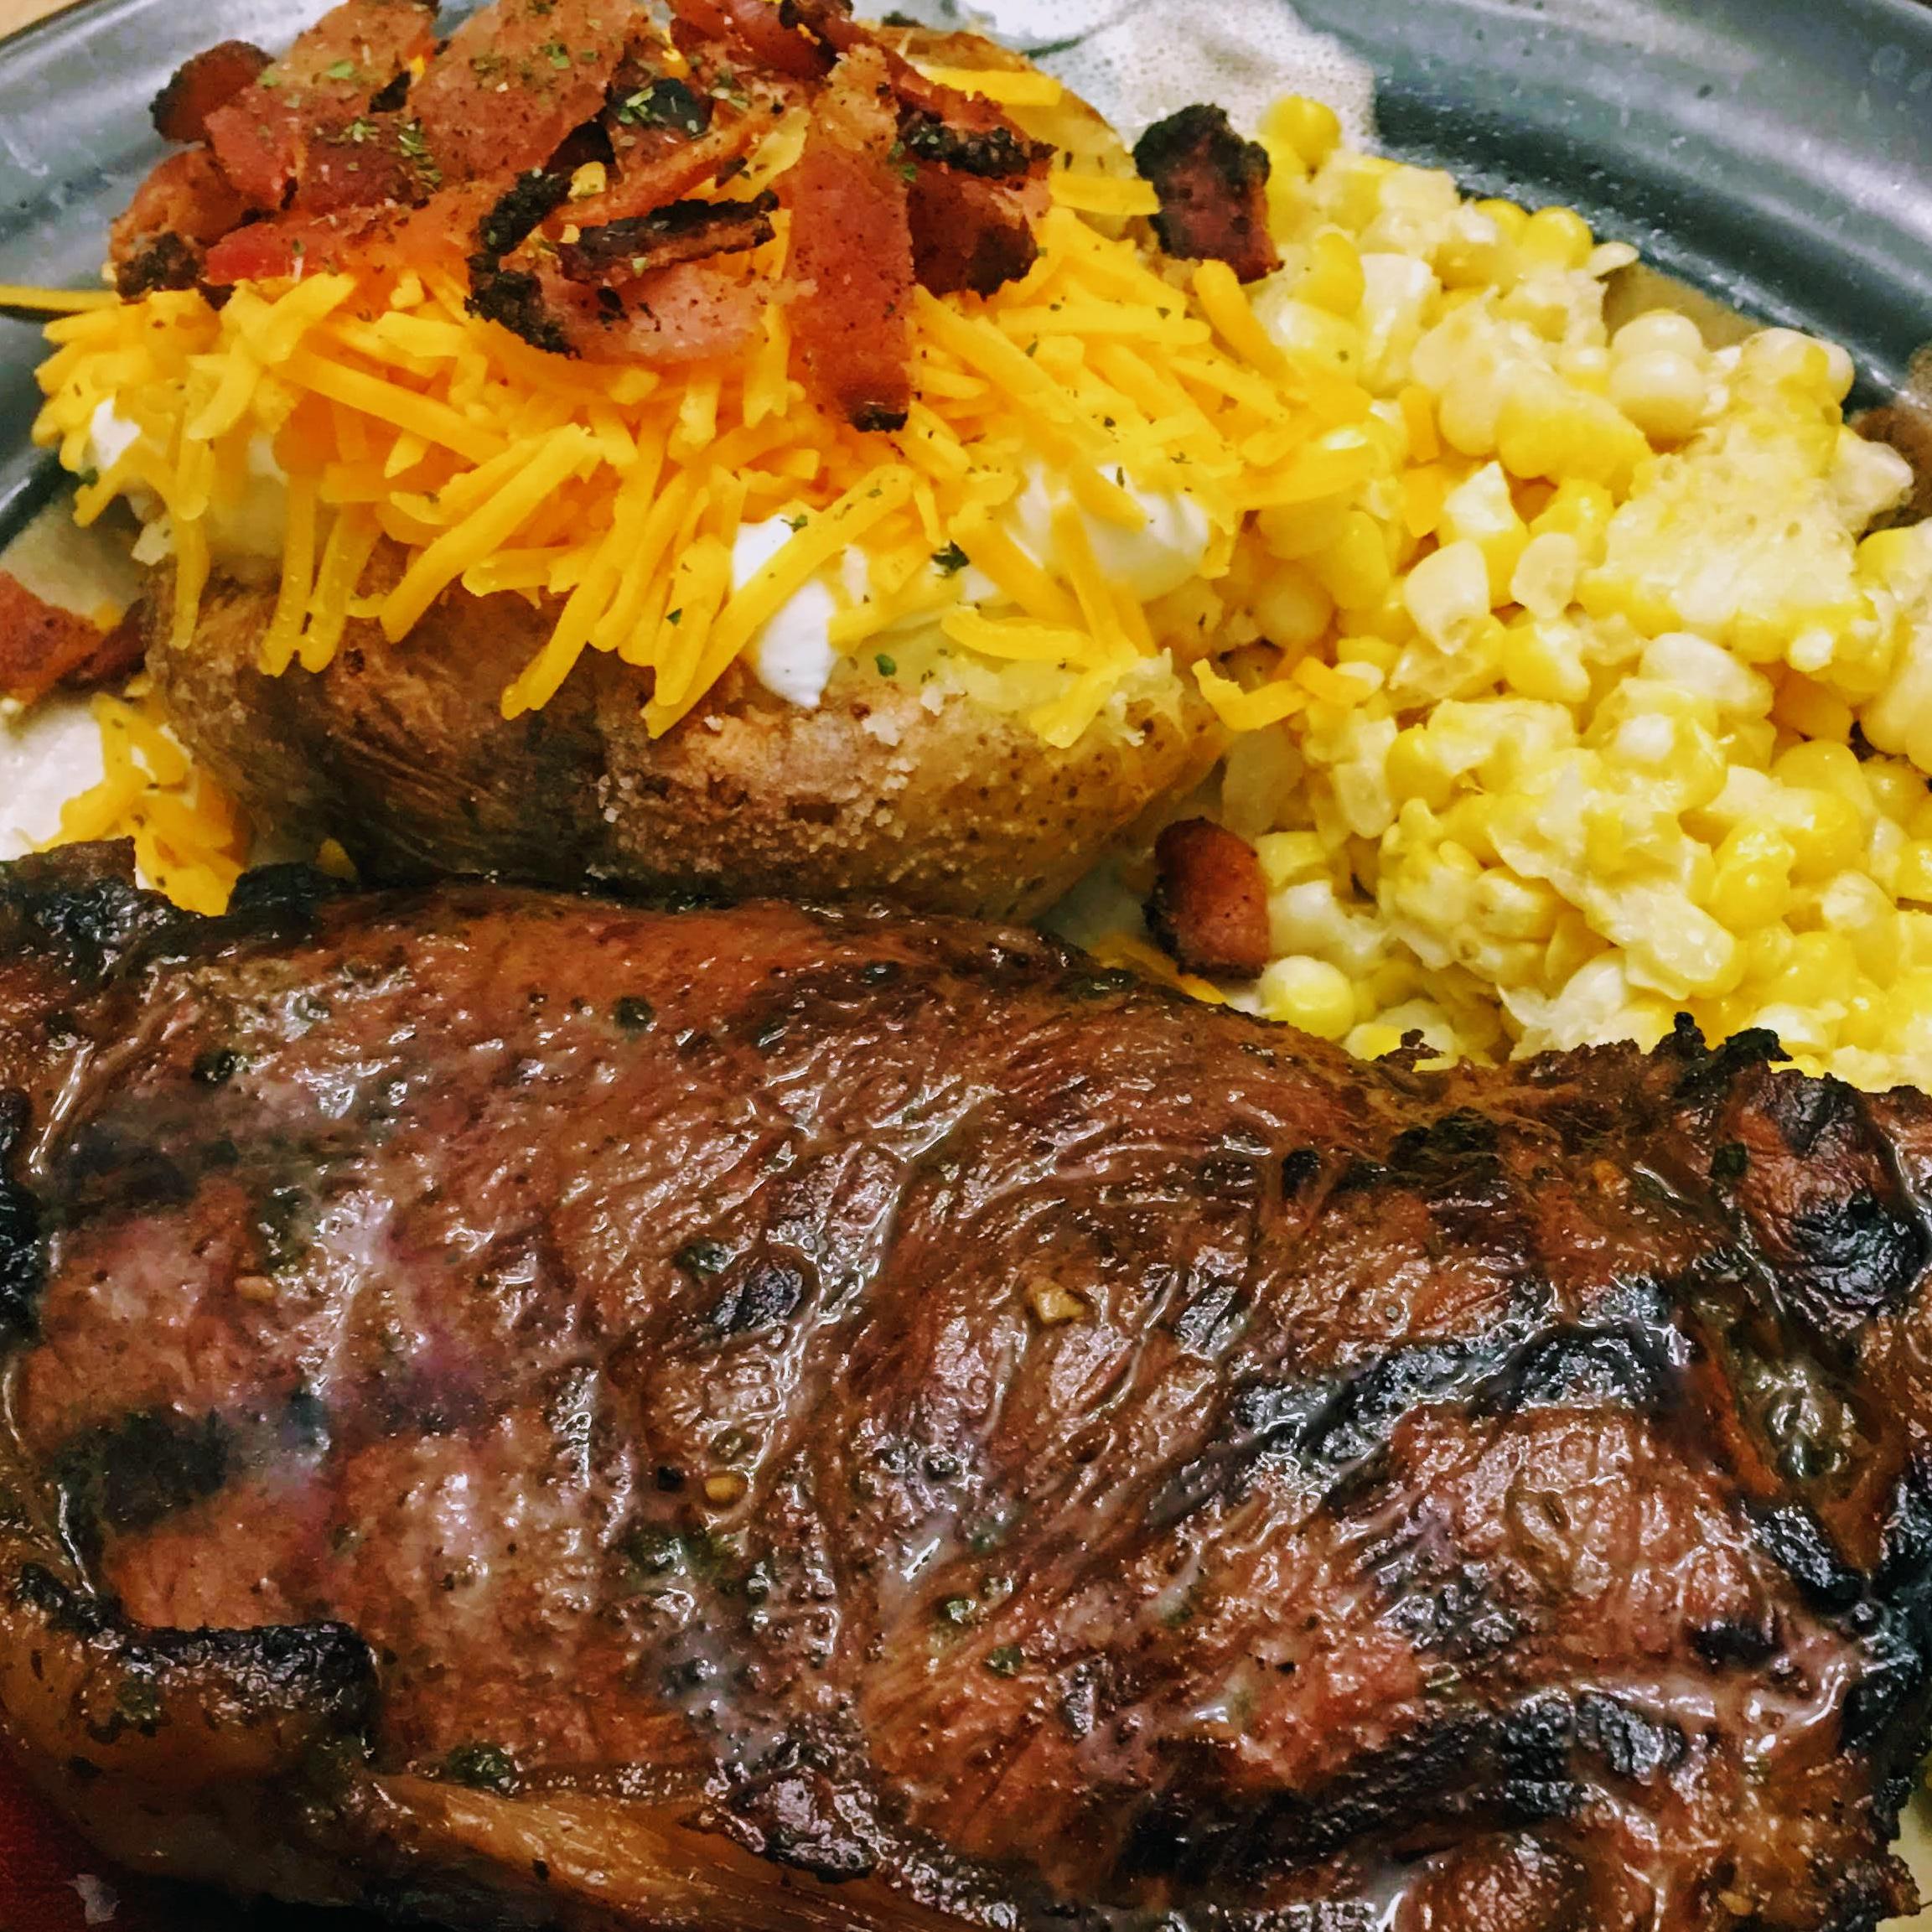 Best Steak Marinade in Existence Jamesej89